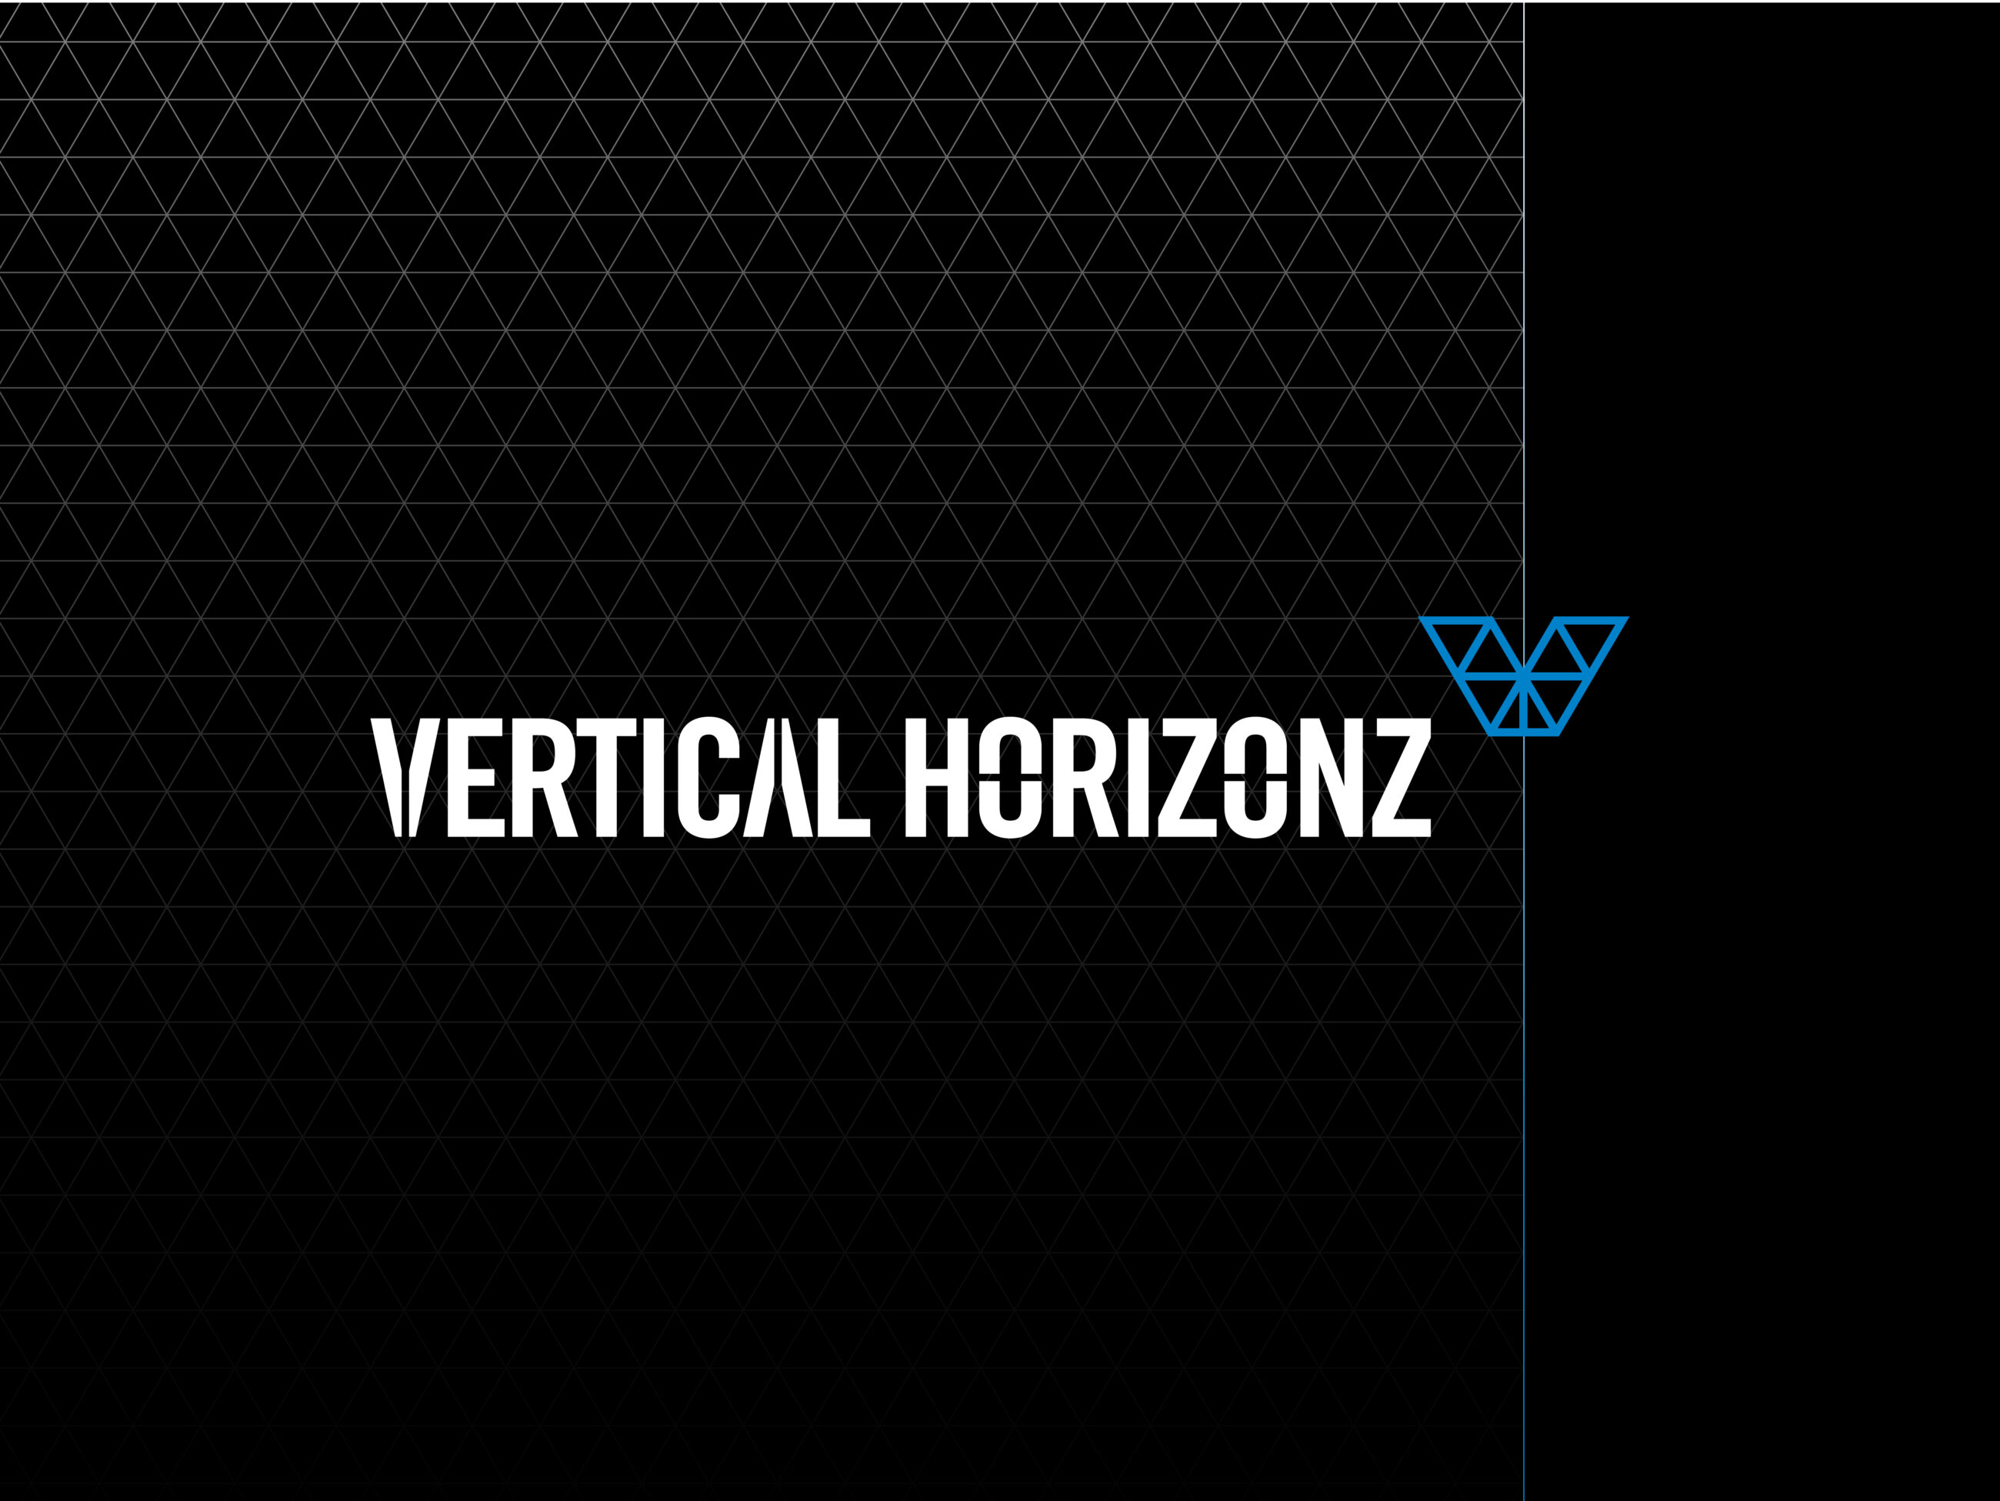 Vertical horizons logo for brand repositioning